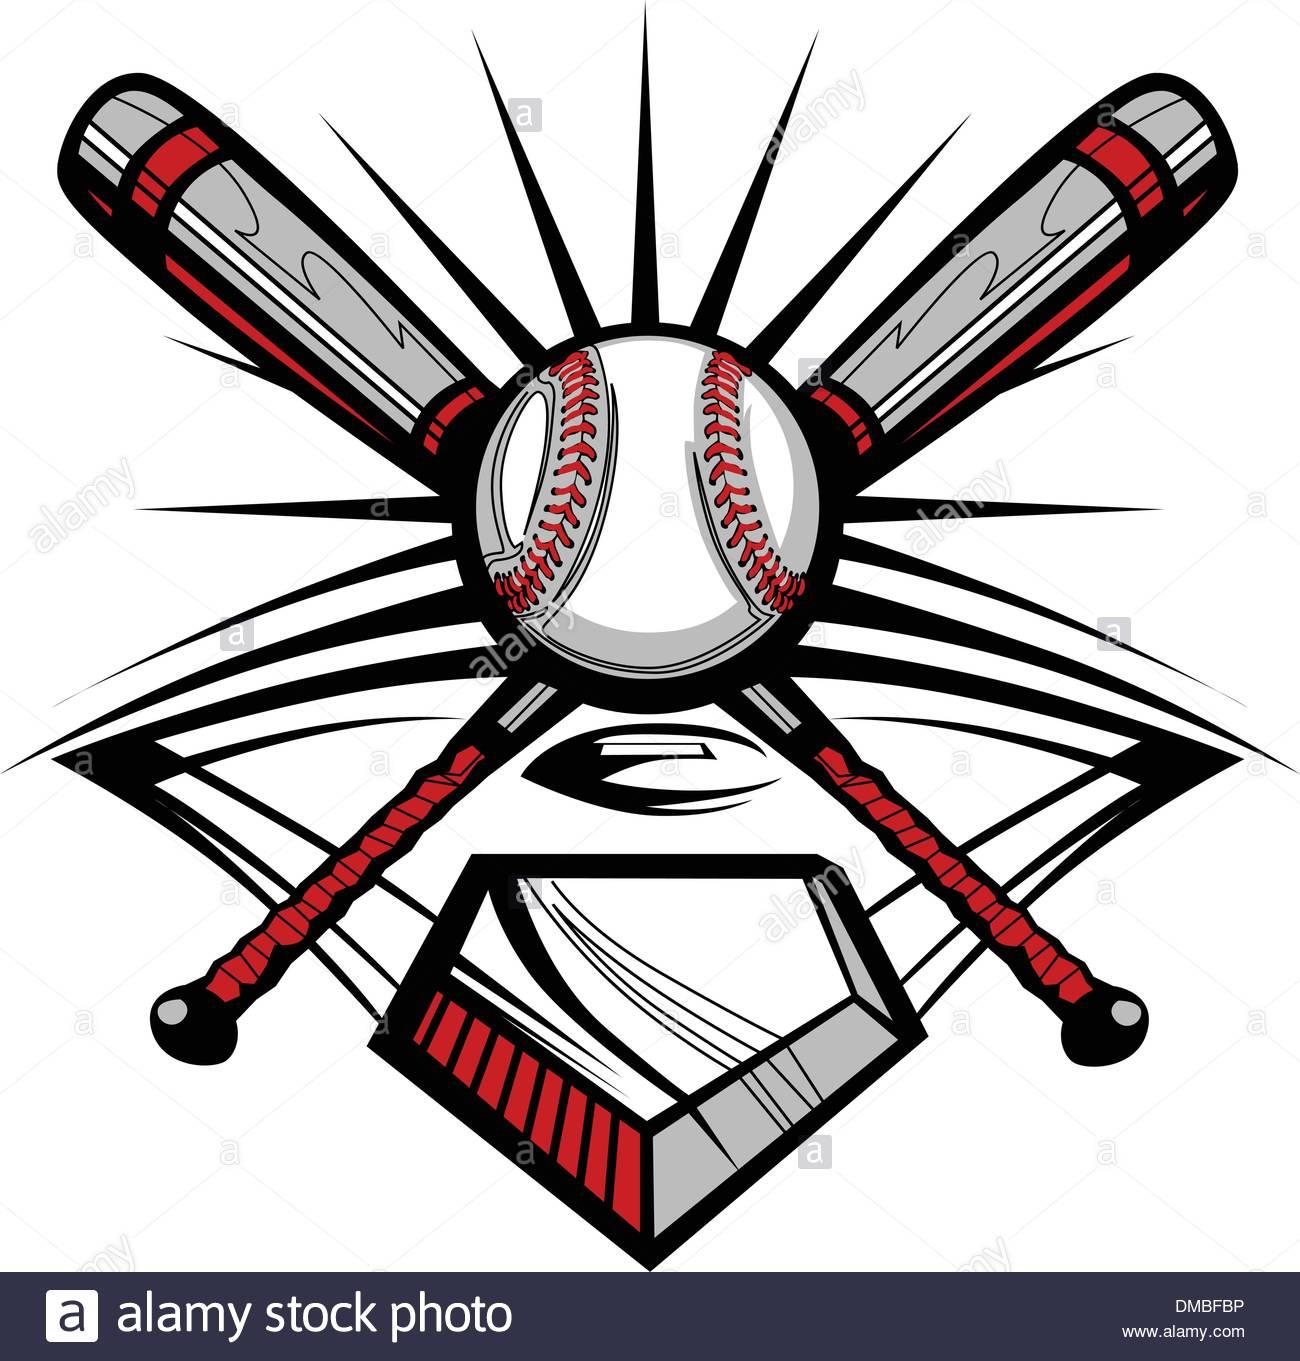 1300x1361 Baseball Or Softball Crossed Bats With Ball Vector Image Template